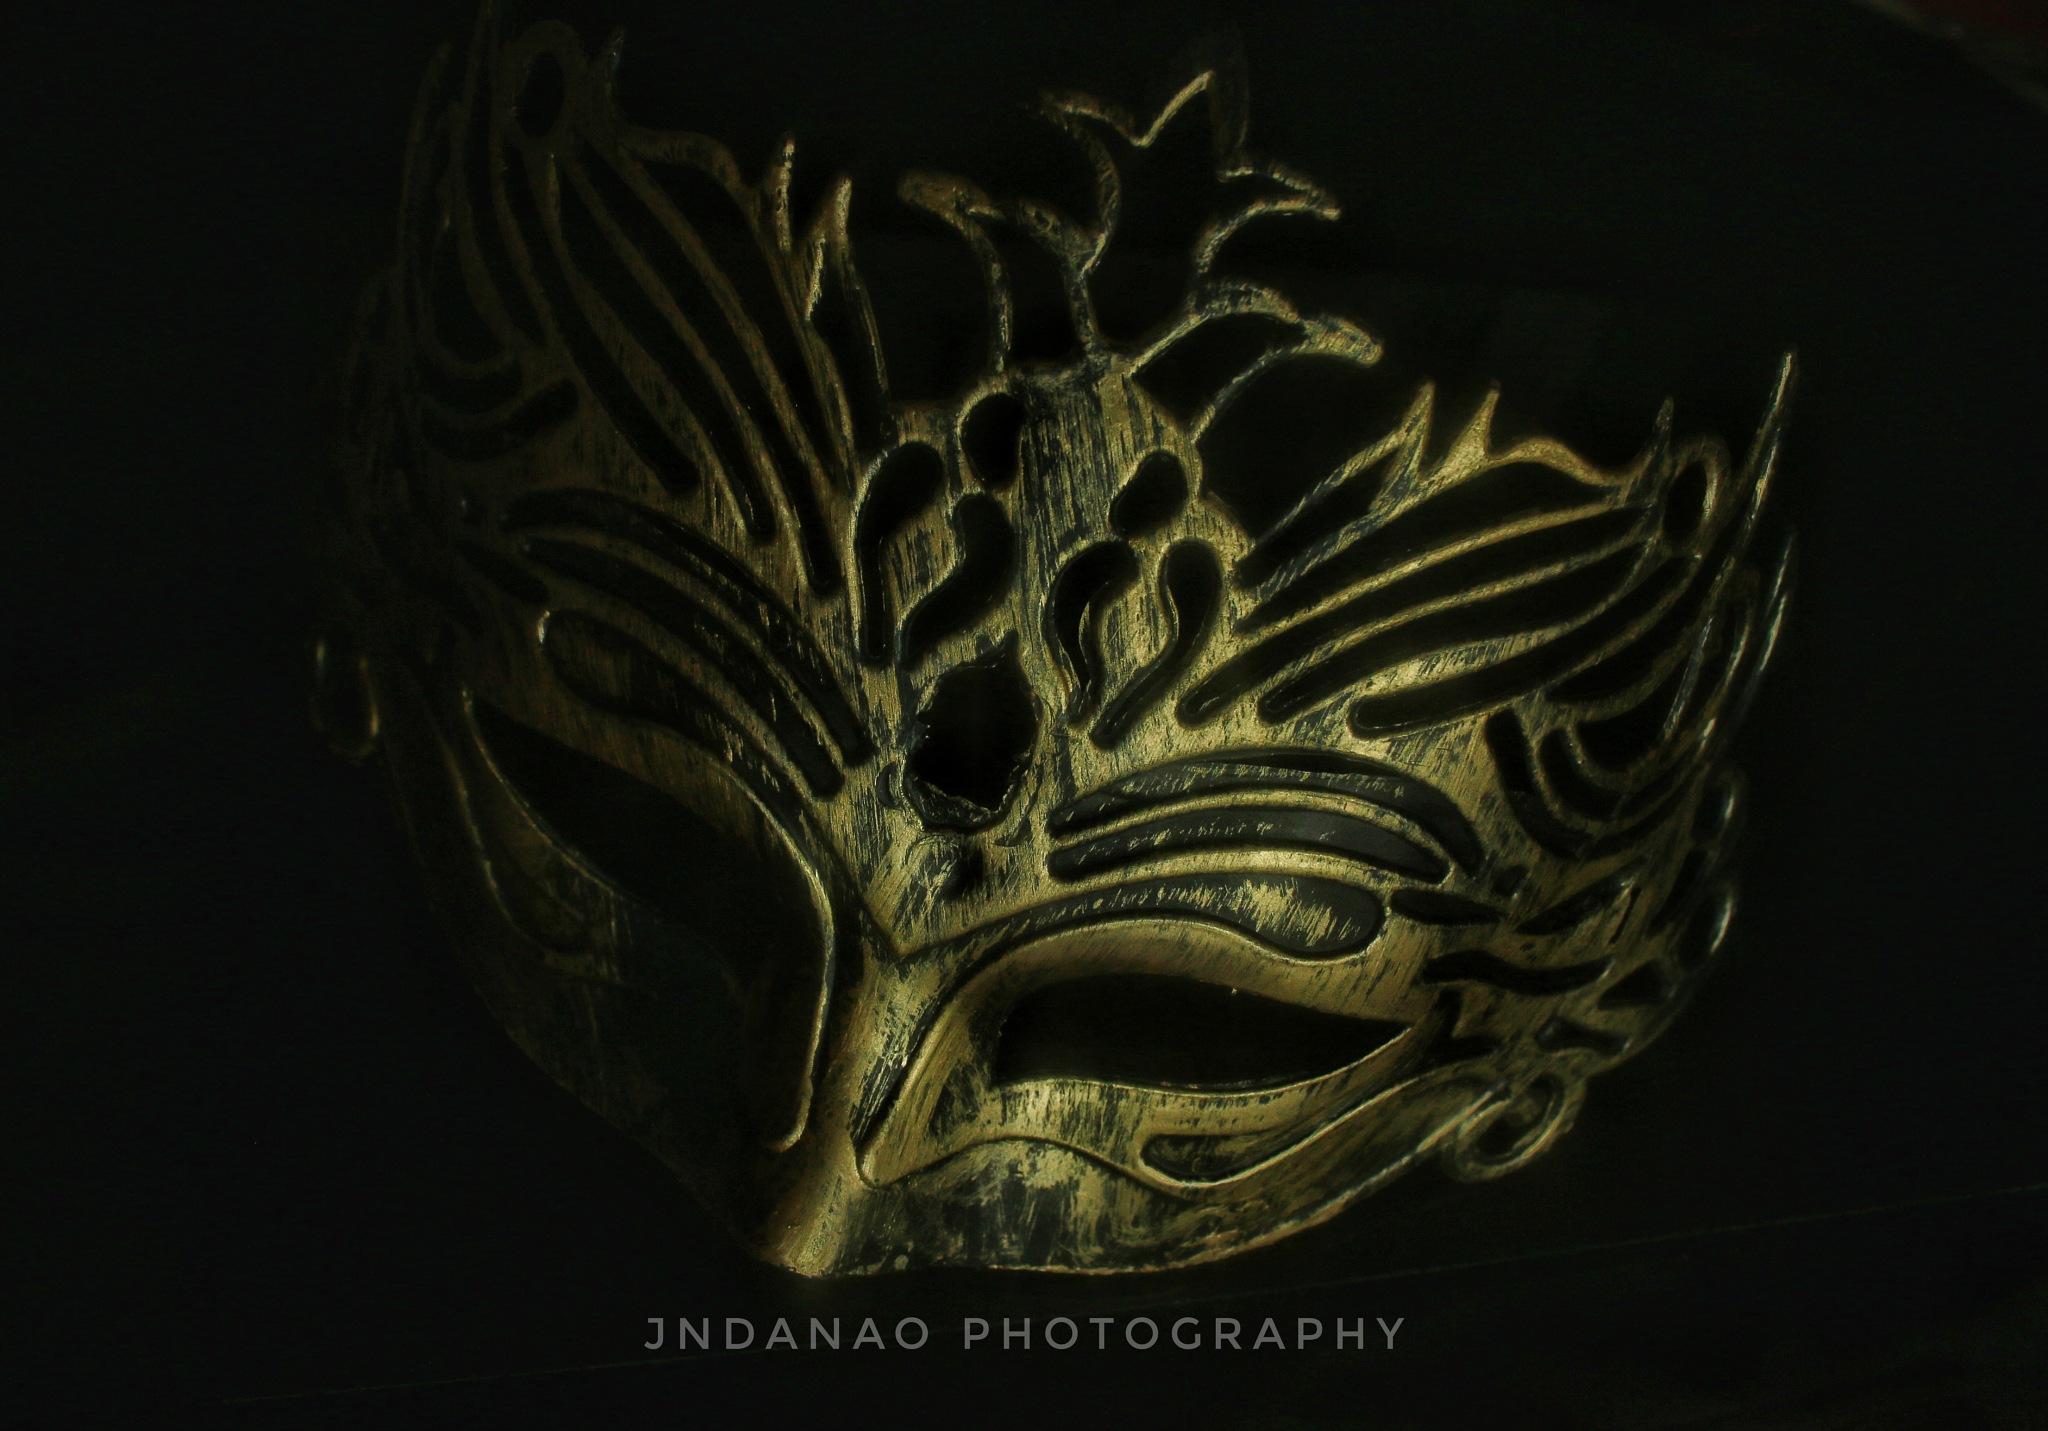 Golden mask by johnNIELDANAO